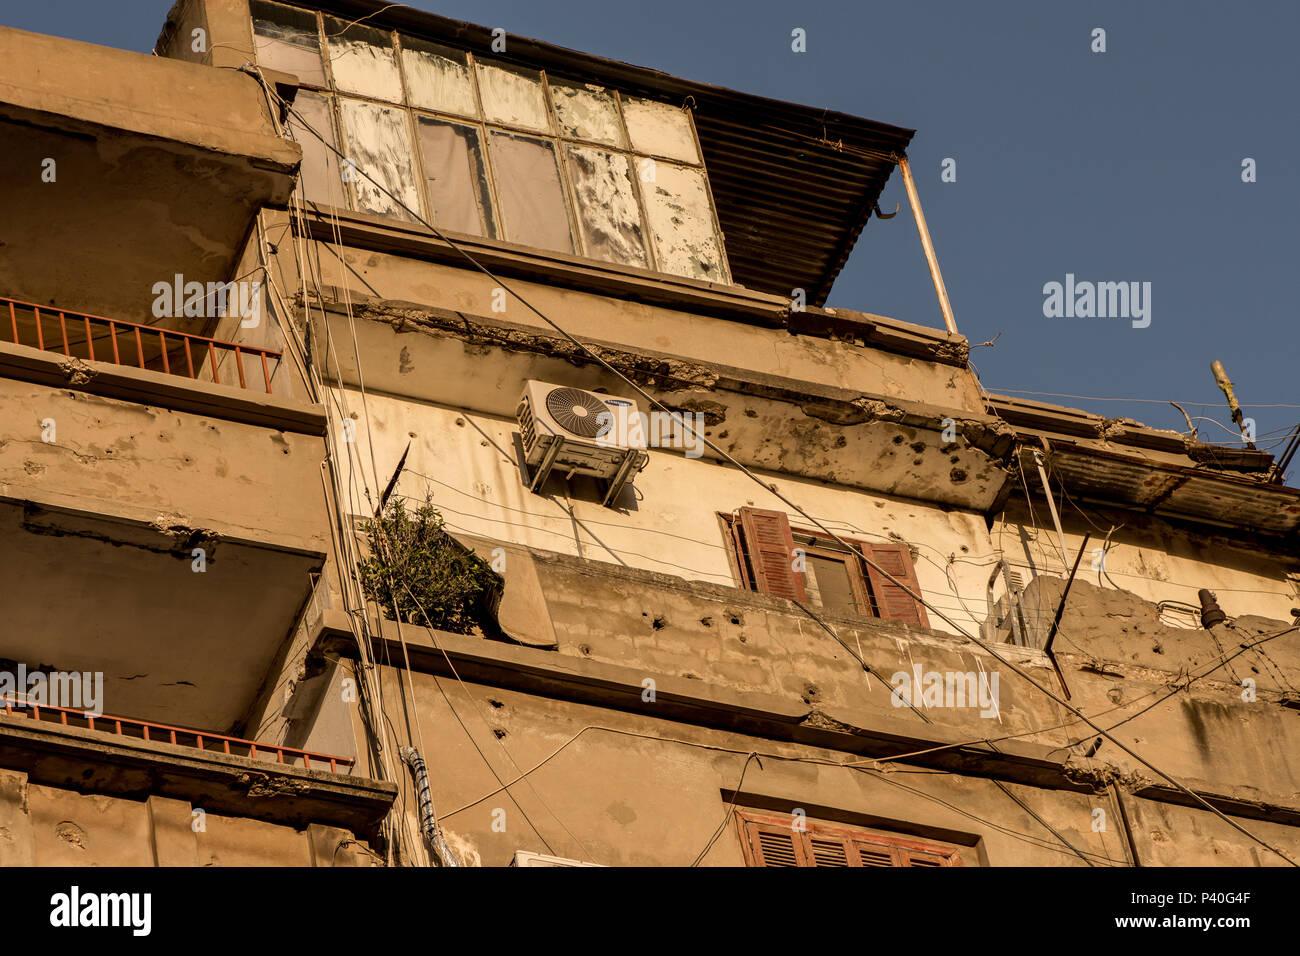 Bullet ridden building - Stock Image